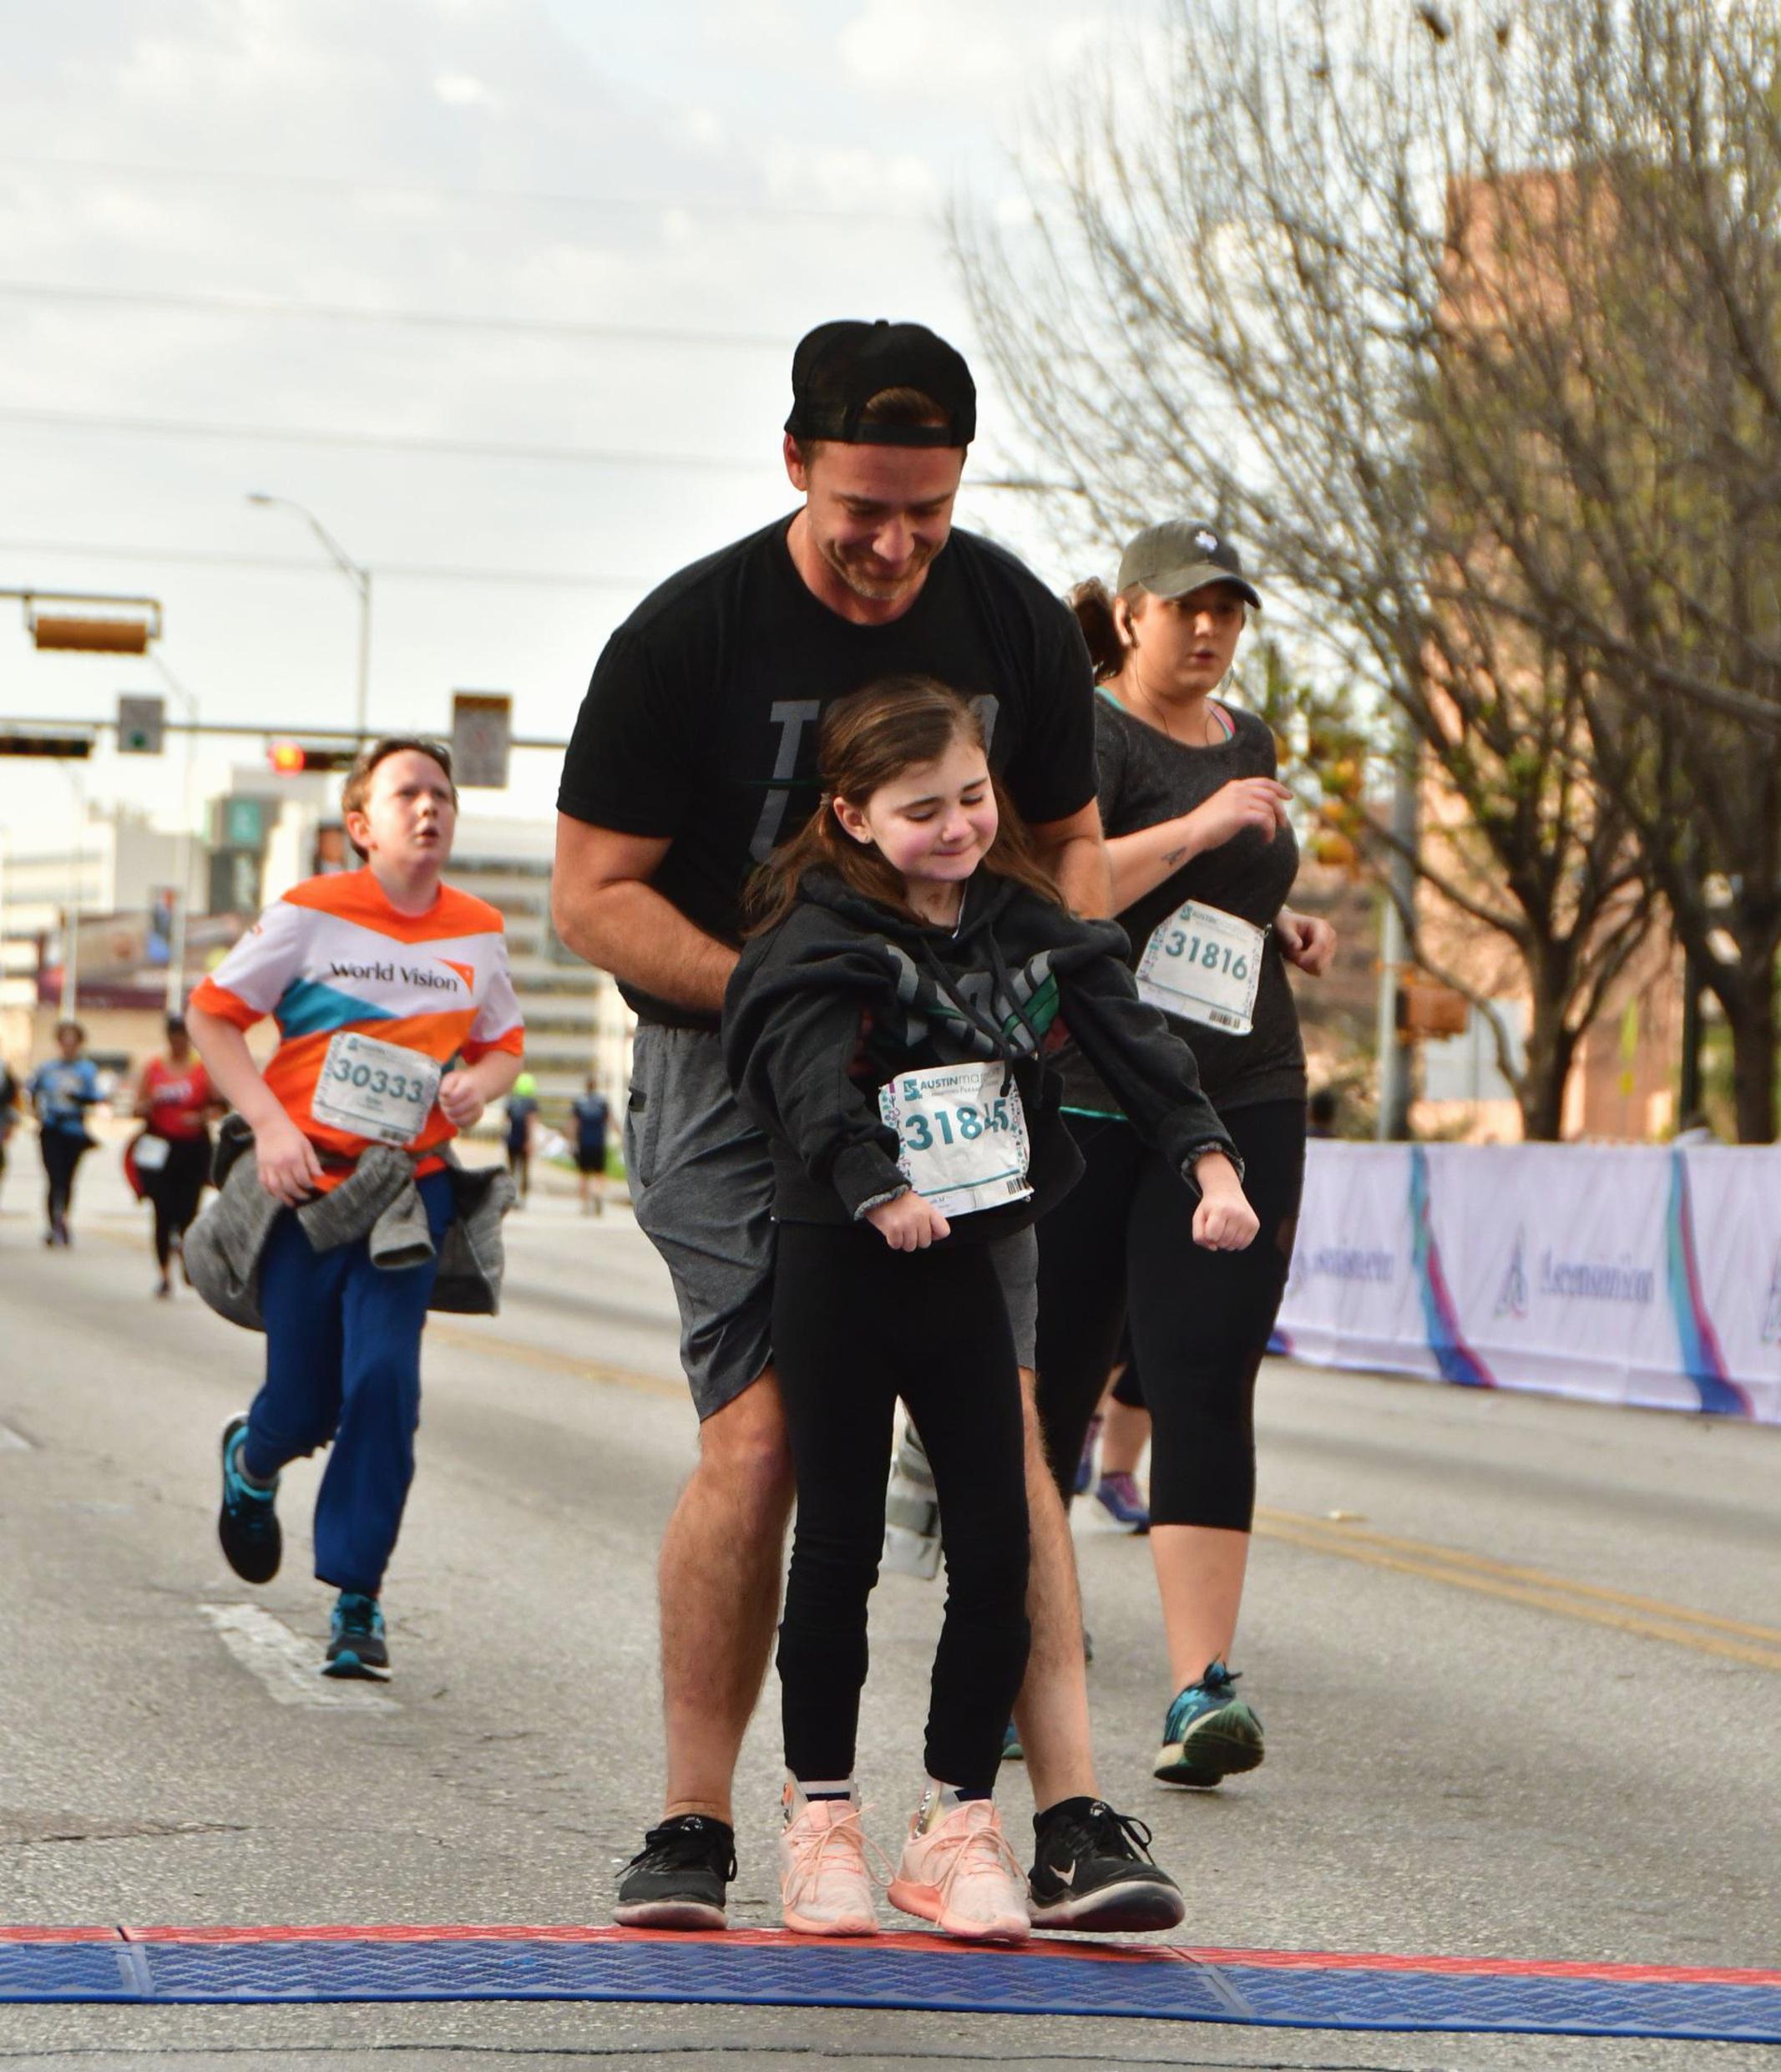 Charley and Barney Sinclair finishing 2019 Austin Marathon 5K